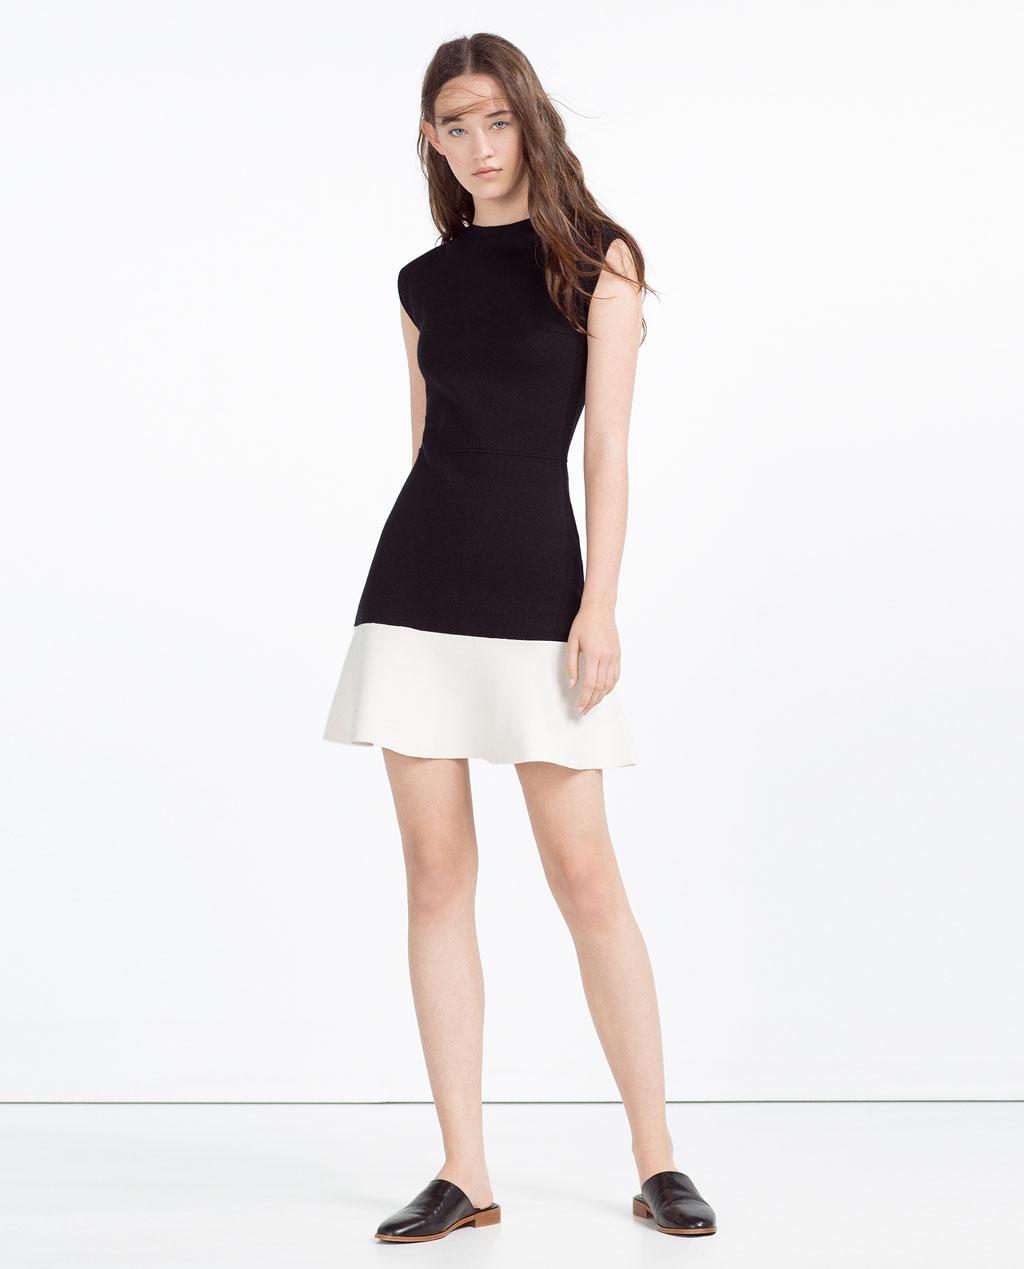 foremata zara anixi 2016 - Φορέματα Zara άνοιξη 2016